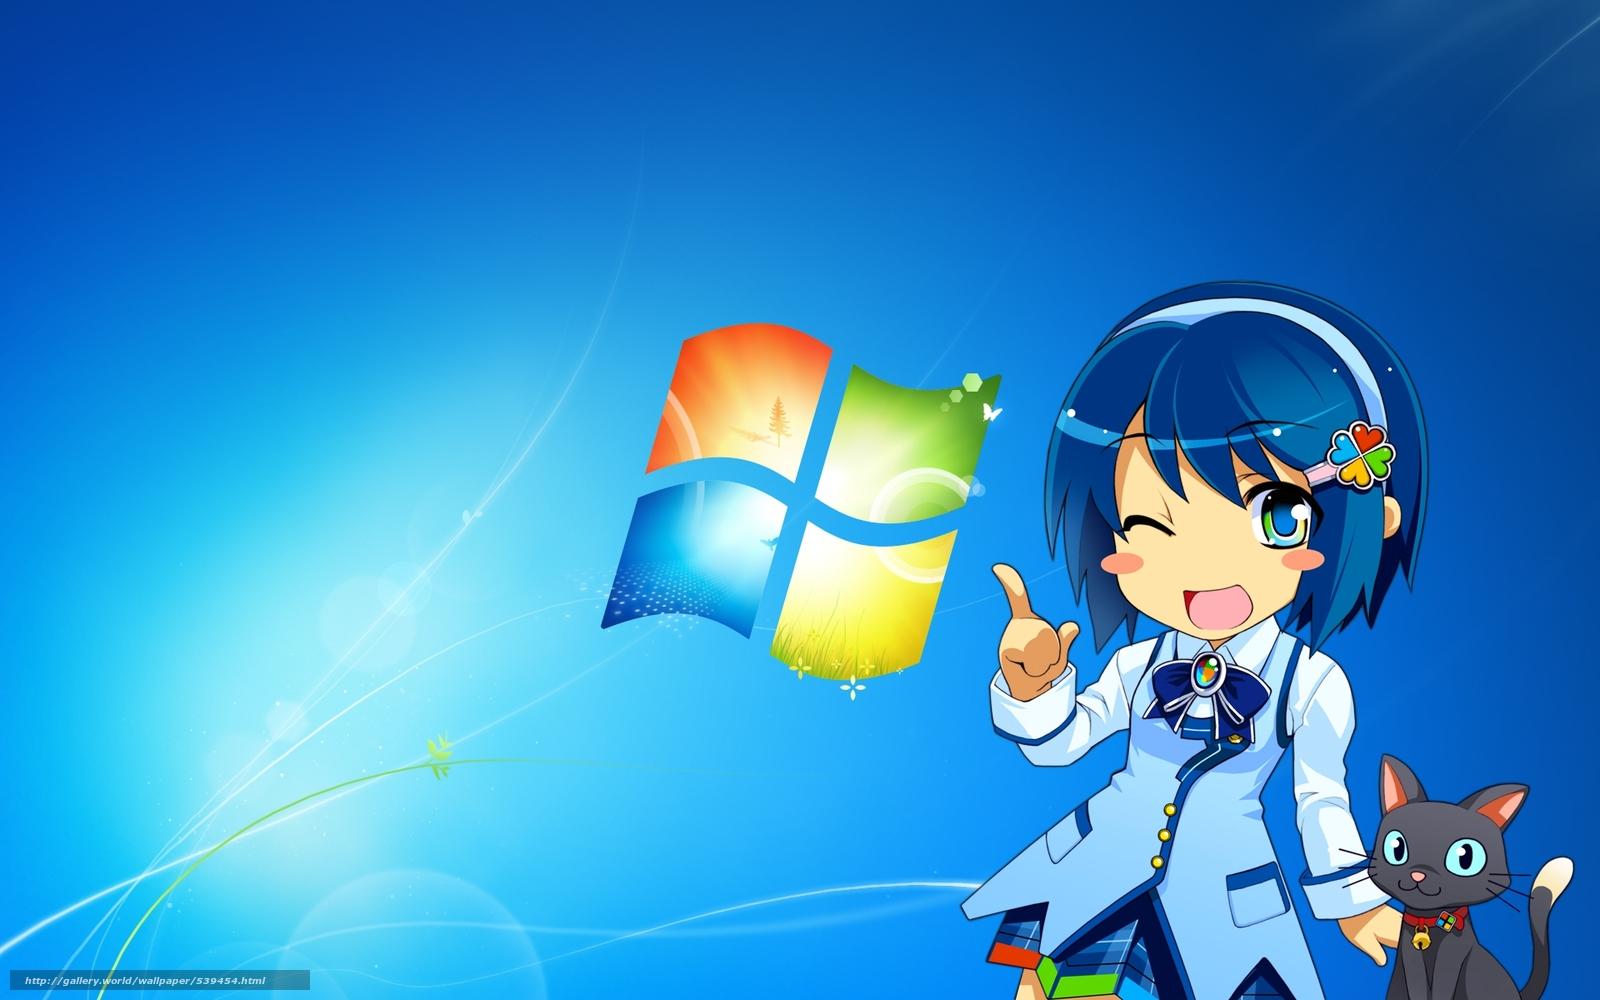 Download Wallpaper Windows 7 Wallpapers 3d Free Desktop